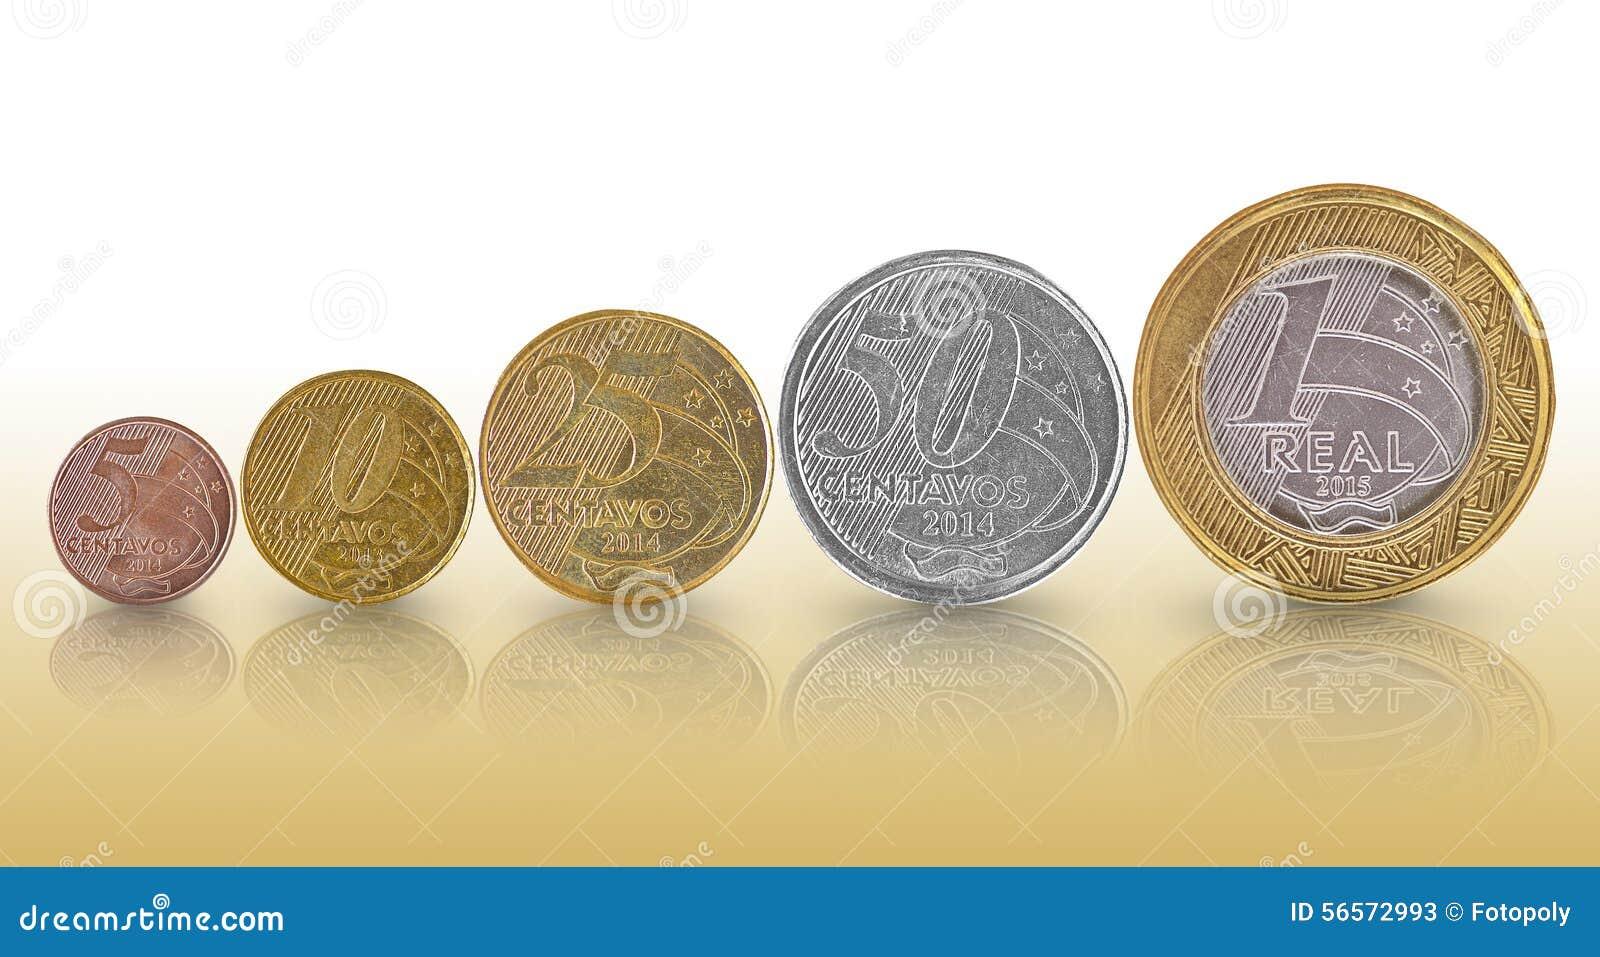 Download Βραζιλιάνα πραγματική γραφική παράσταση αύξησης νομισμάτων Στοκ Εικόνα - εικόνα από προϋπολογισμών, αναλυτικό: 56572993